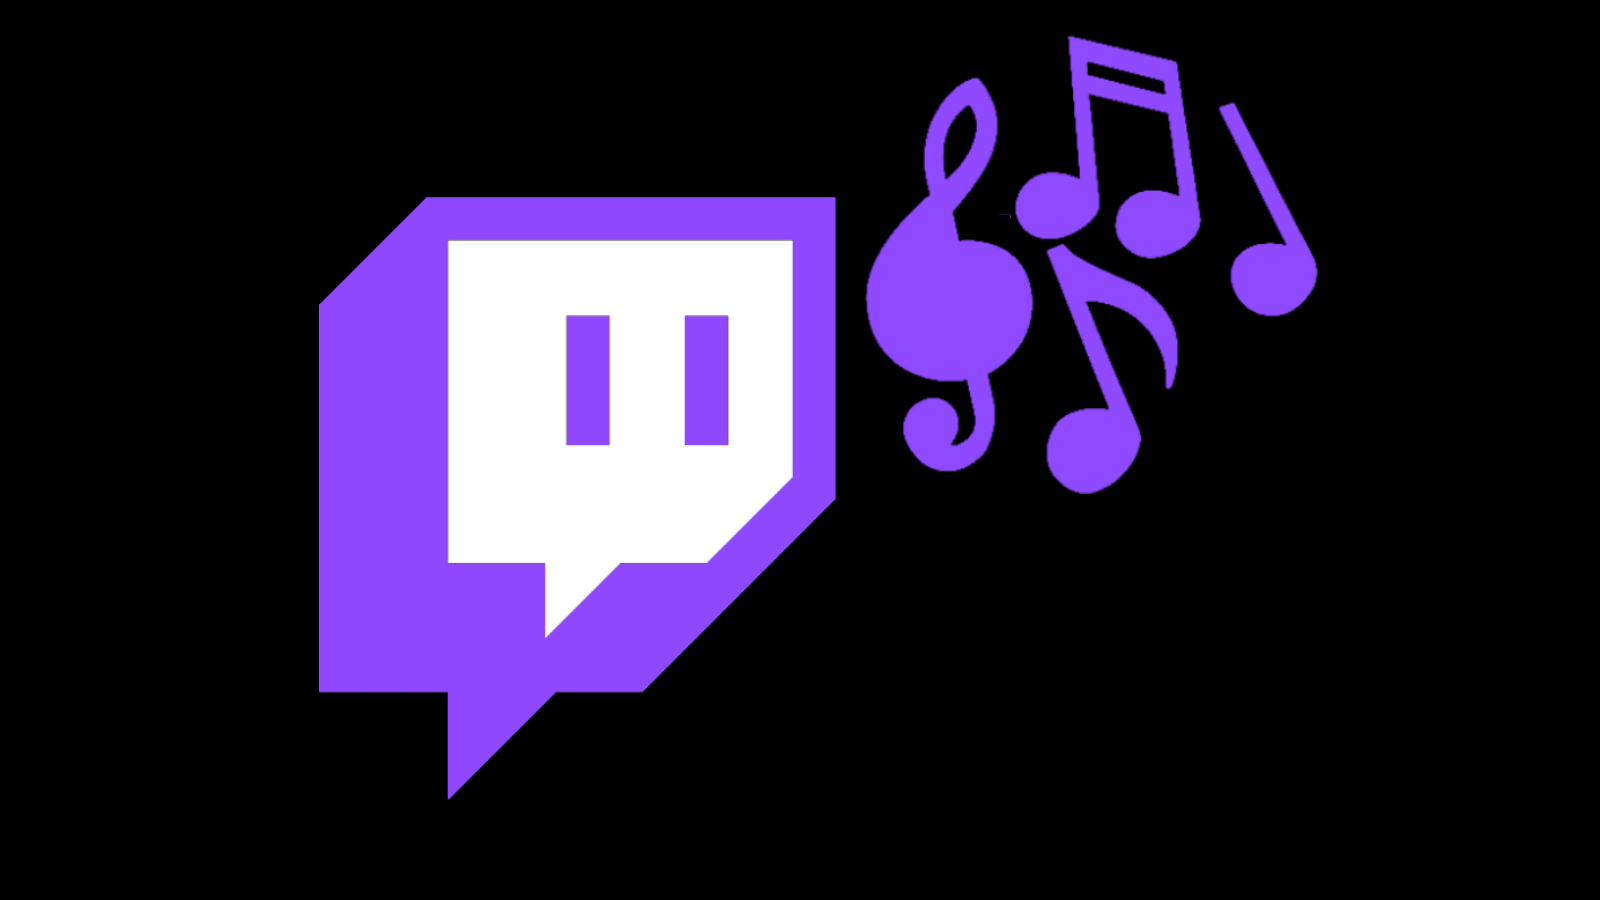 Twitch game audio streams DMCA